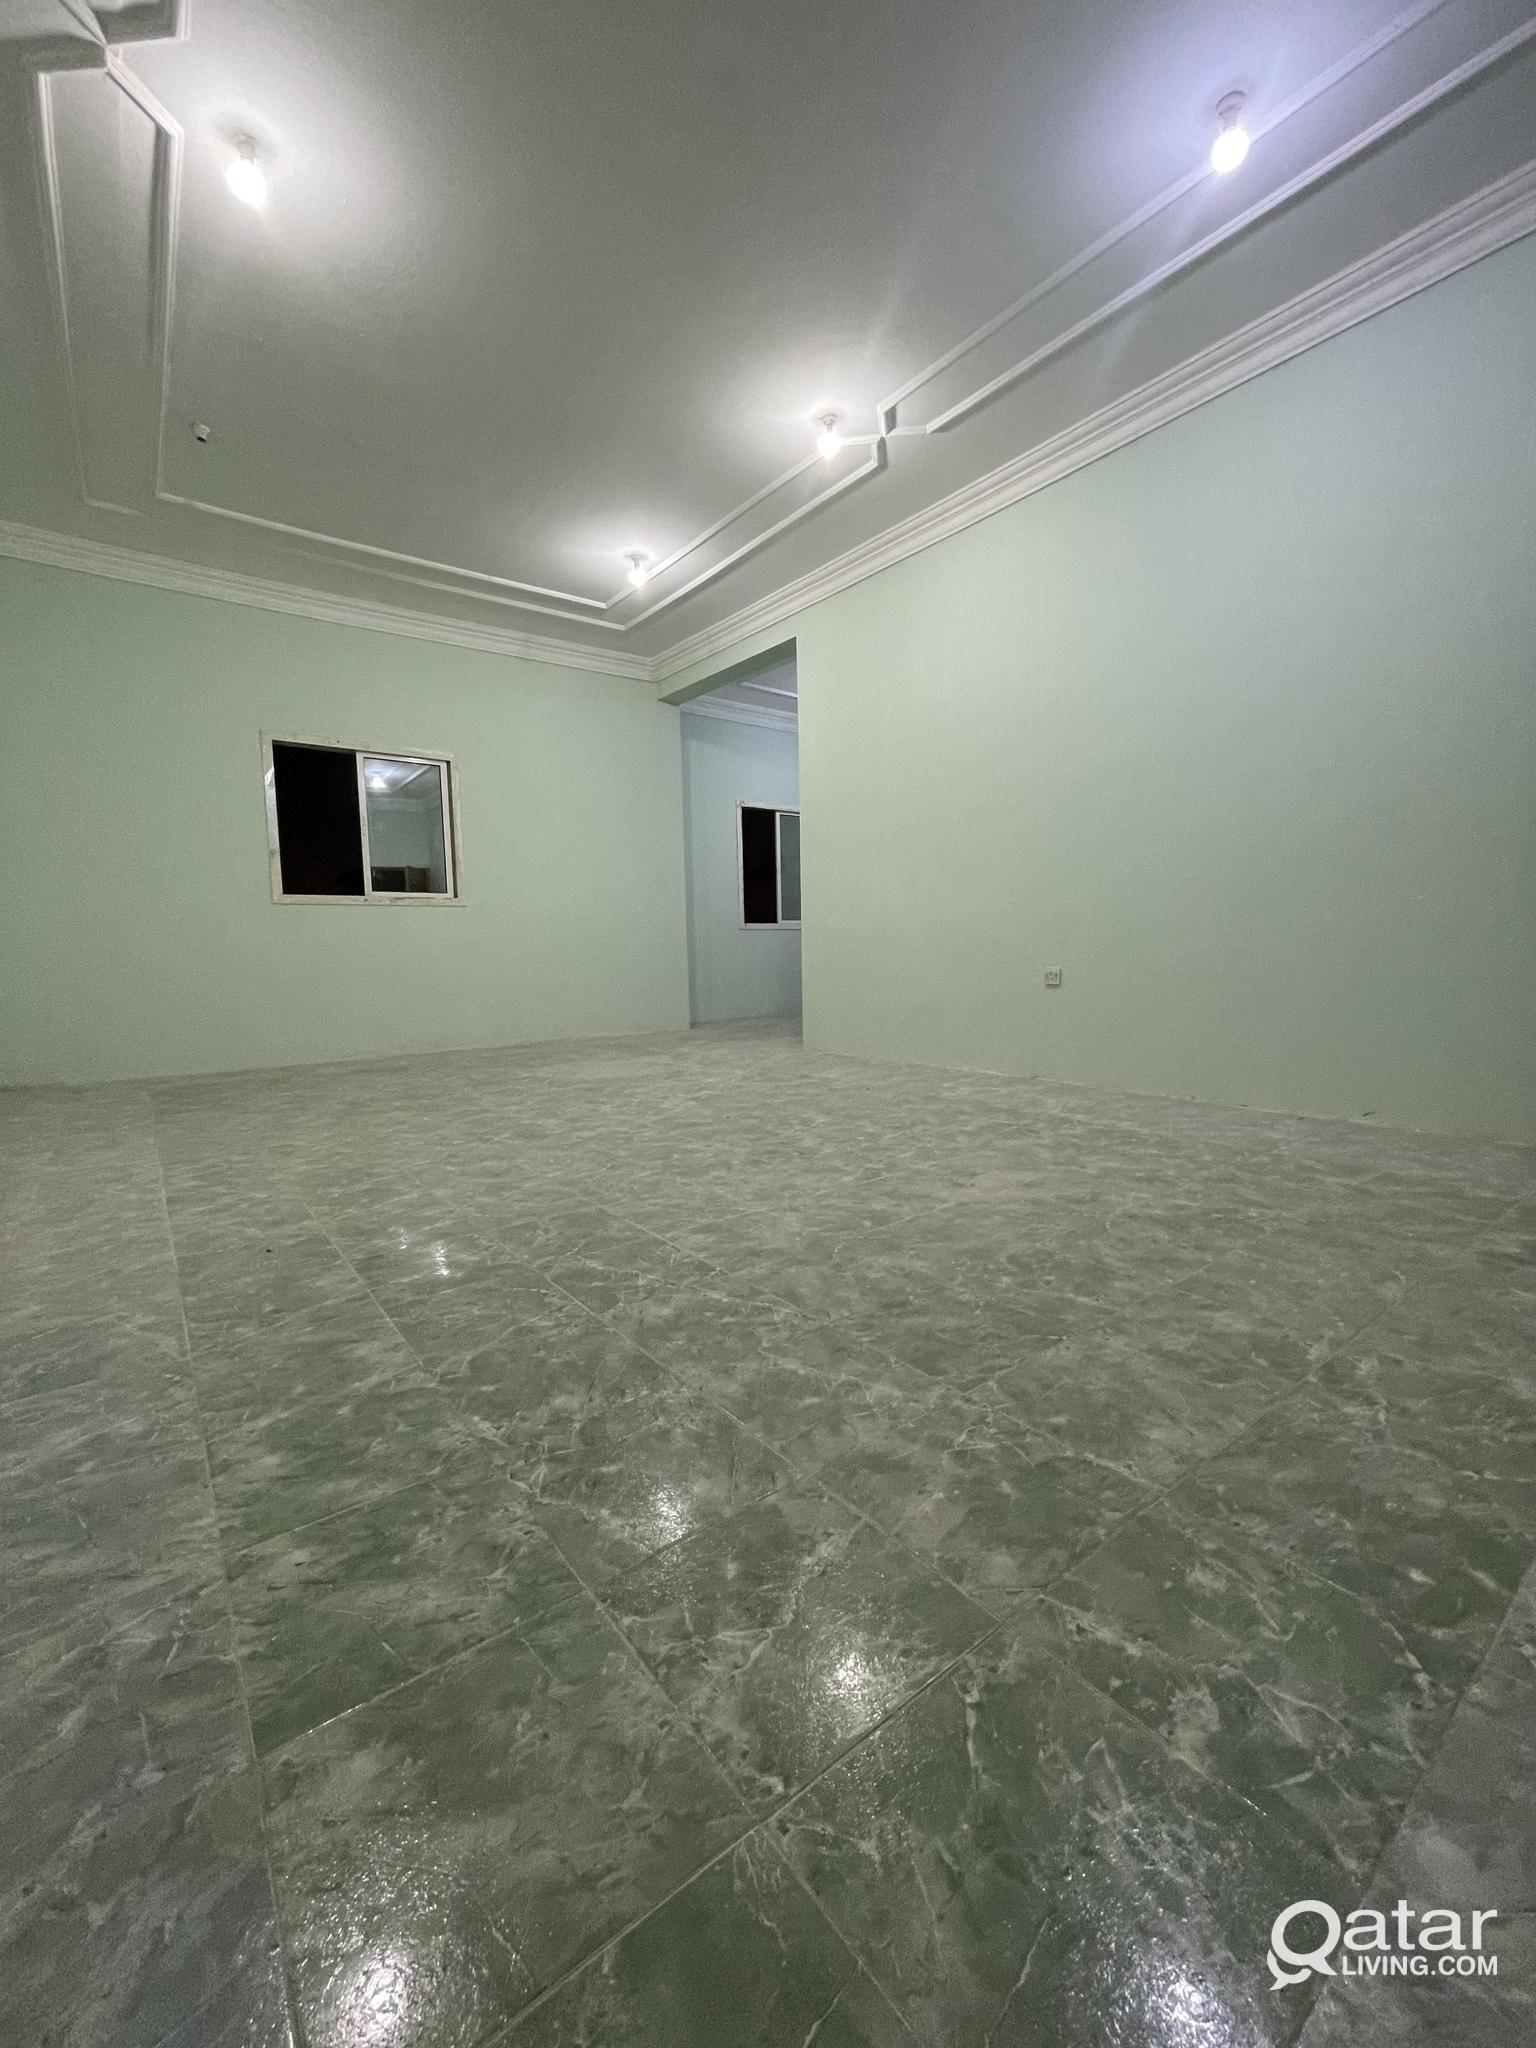 7bhk spacious villas for rent no commission